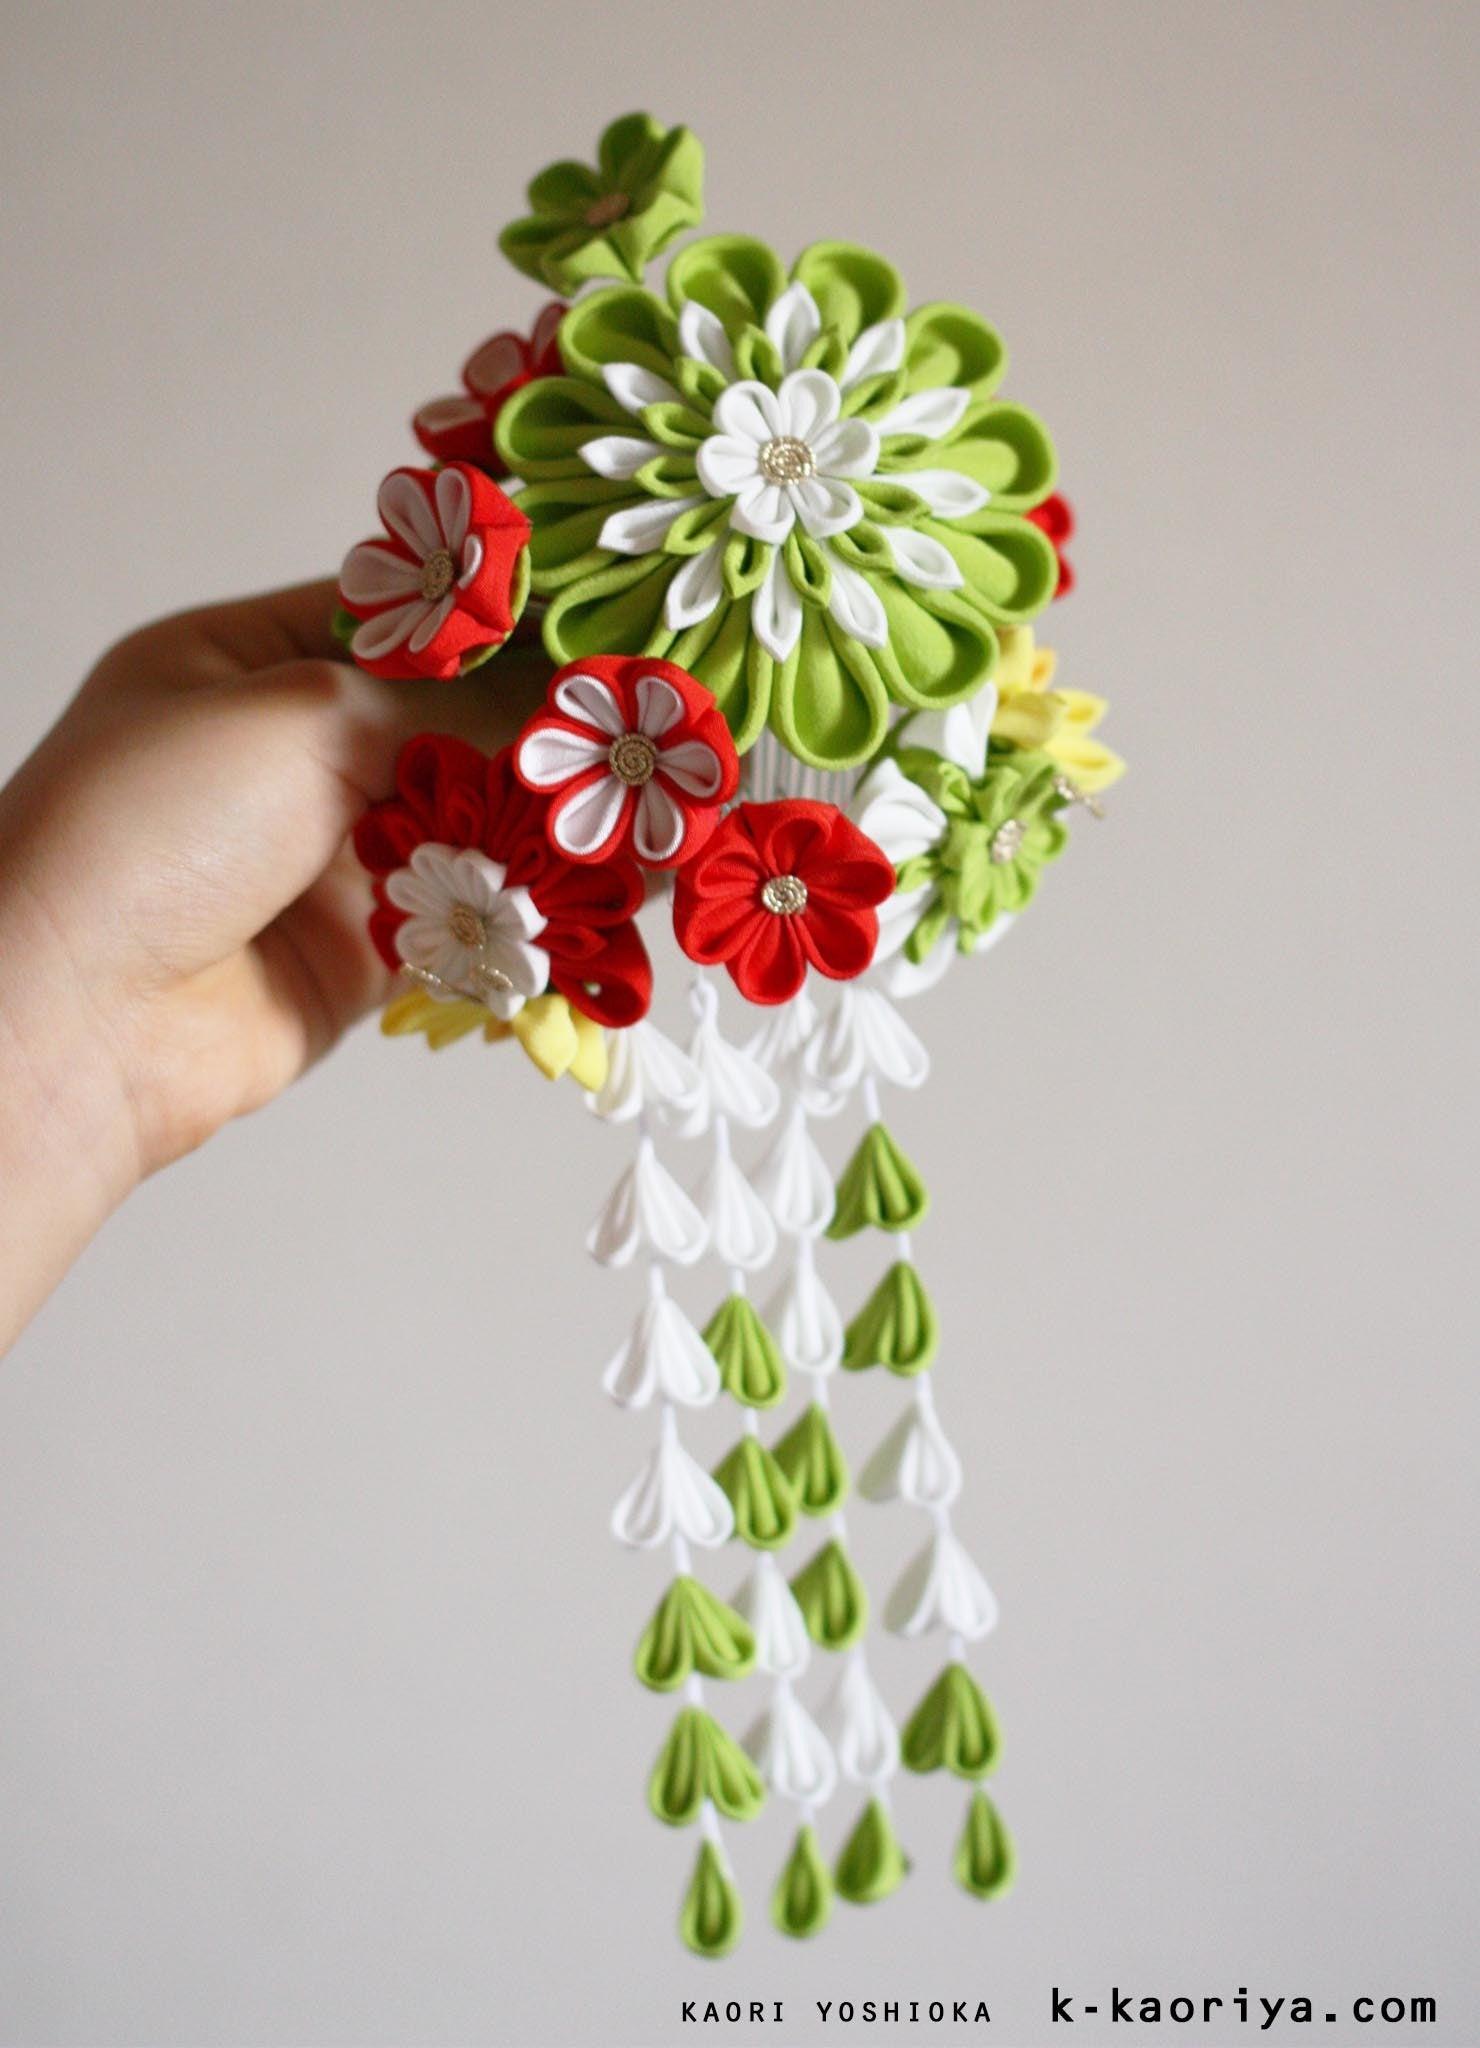 KYOTO 加織屋のブログ 京都のつまみ細工  髪飾り かんざし 成人式 卒業式 七五三 成人式の髪飾り。「大輪に蝶」(つまみ細工 成人式 かんざし 振袖に合わせて 和装 結婚式)